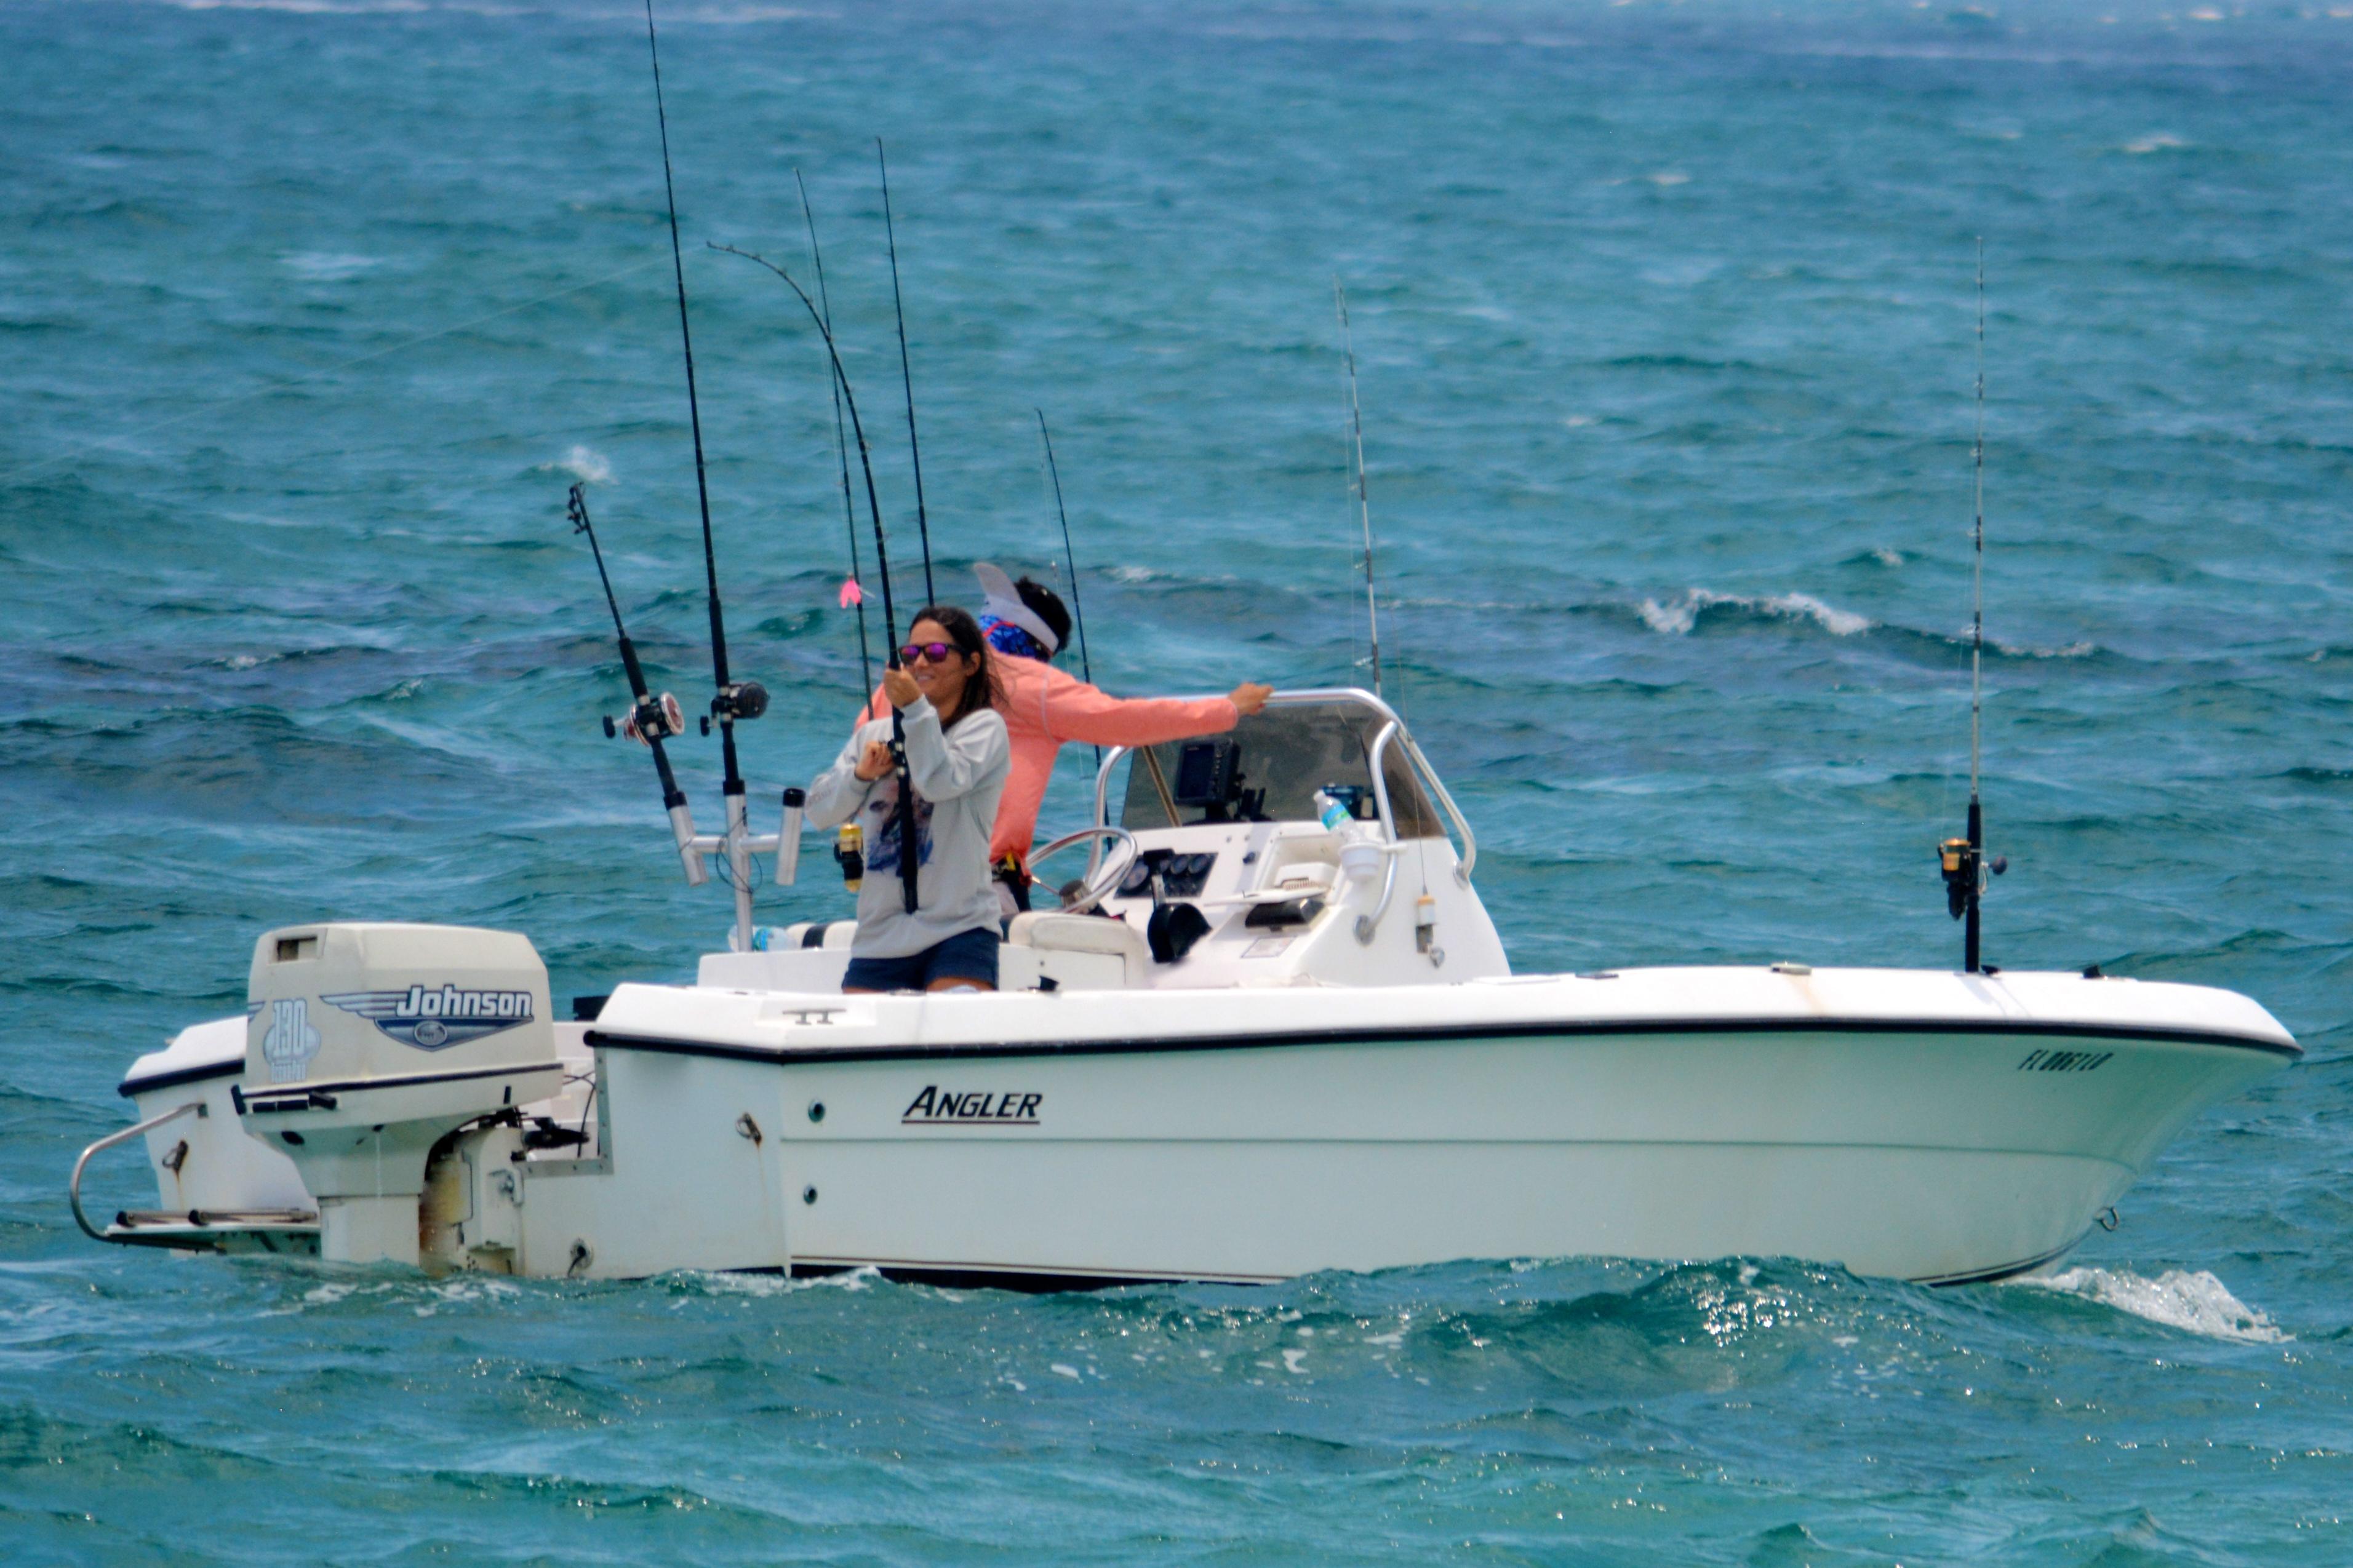 20 angler center console with 140hp suzuki four stroke for Boca raton fishing